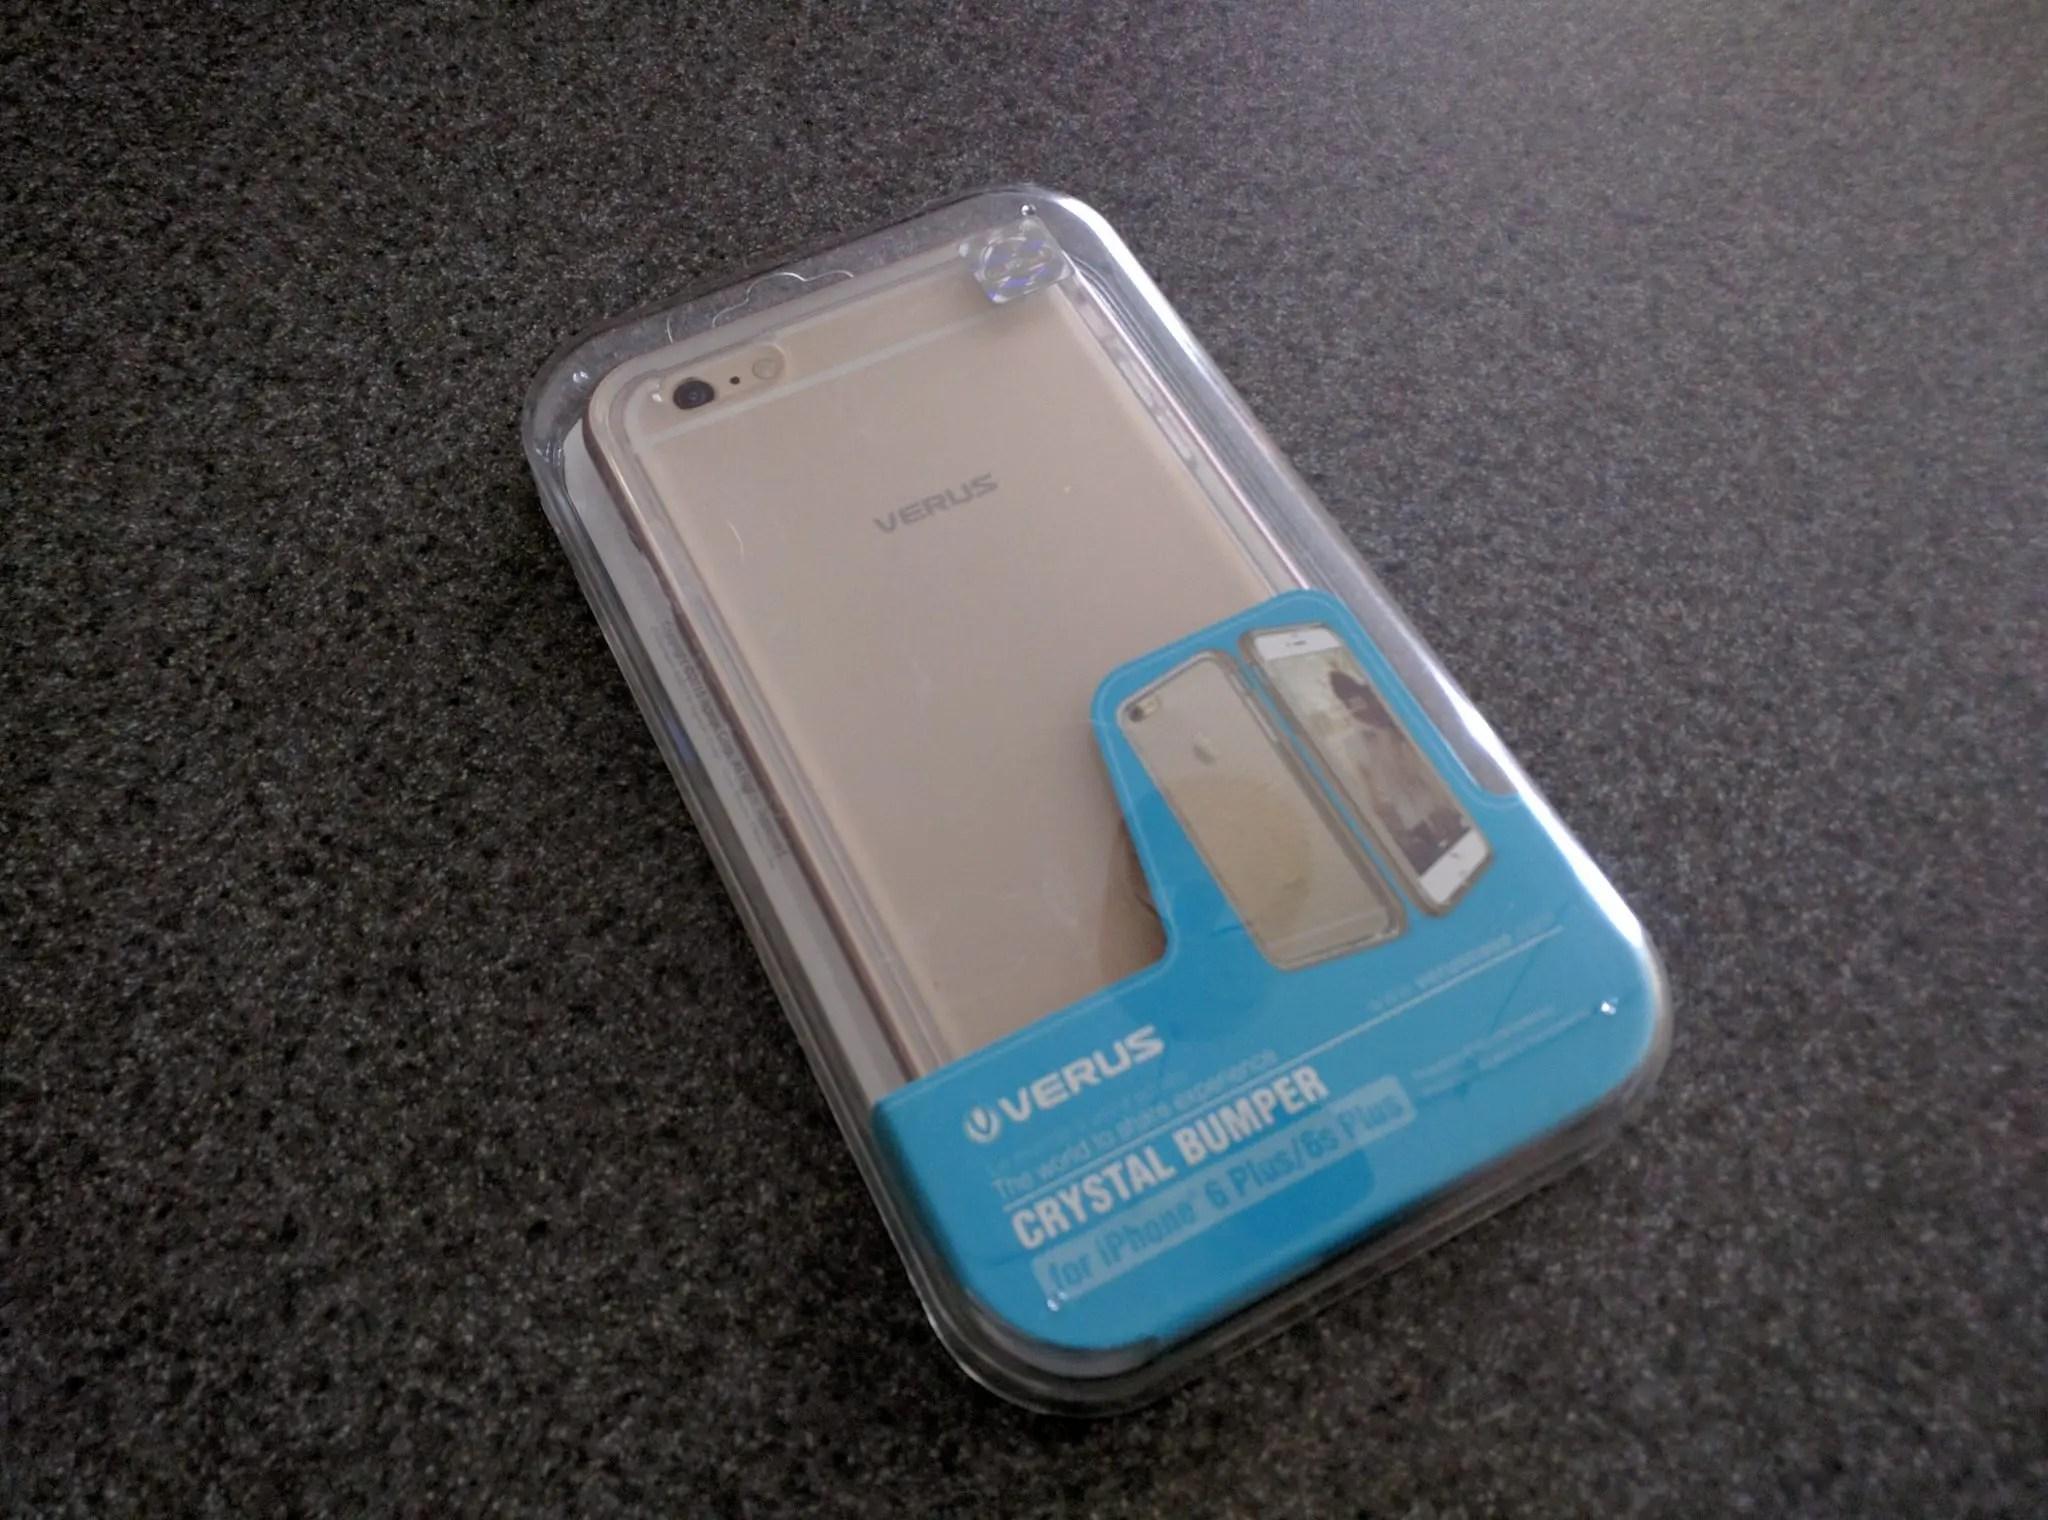 new styles 4e5a7 45a92 Verus Crystal Bumper iPhone 6s Plus Case   Kyle A. Morris